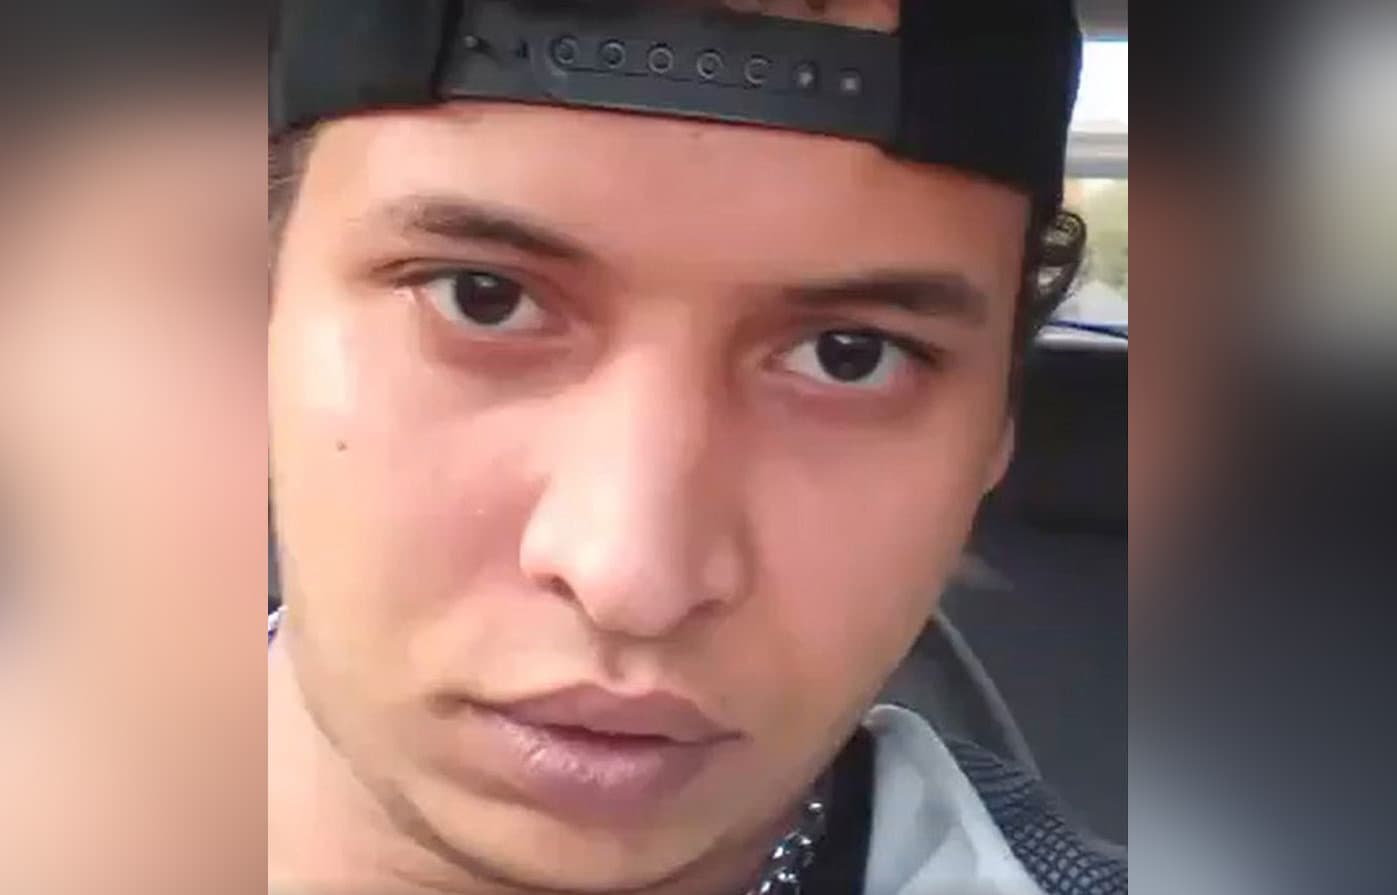 Khairi Saadallah, reading, gay, men, stabbed